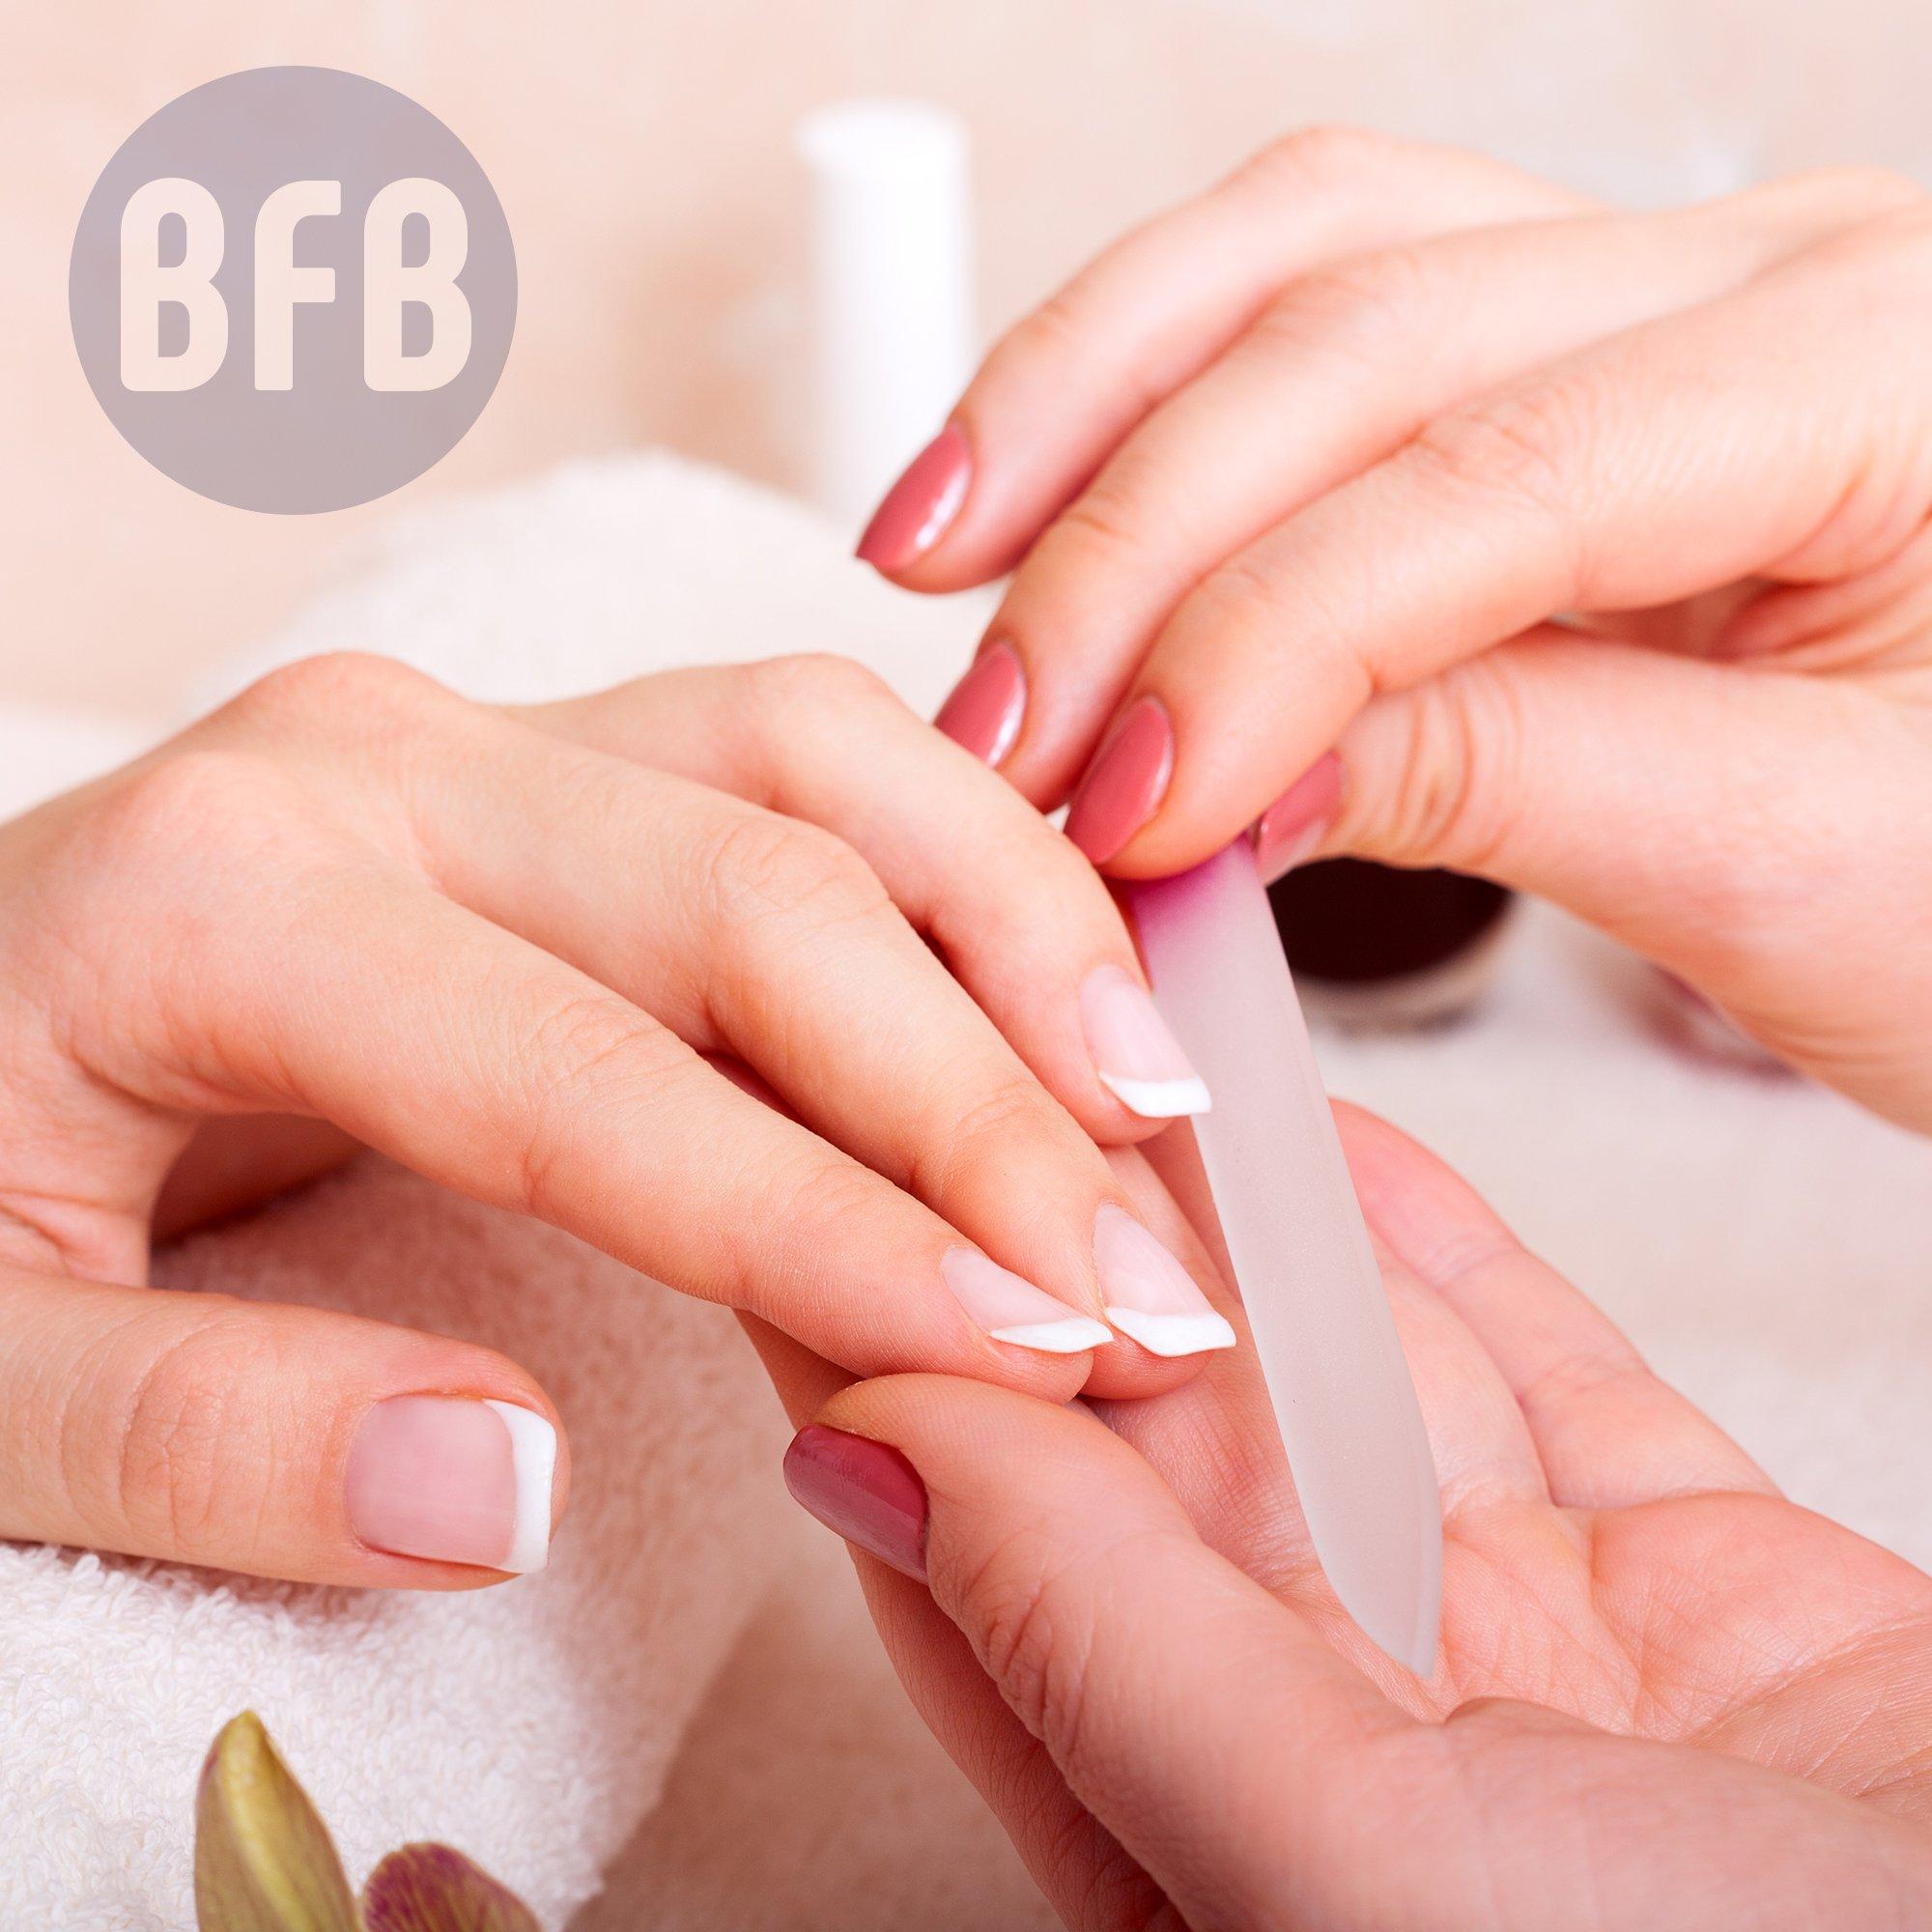 Glass Nail File Manicure Set, Fingernail File Nail Care, Manicure Tools by Bona Fide Beauty (5-Piece Set) Made in The Czech Republic by Bona Fide Beauty (Image #7)